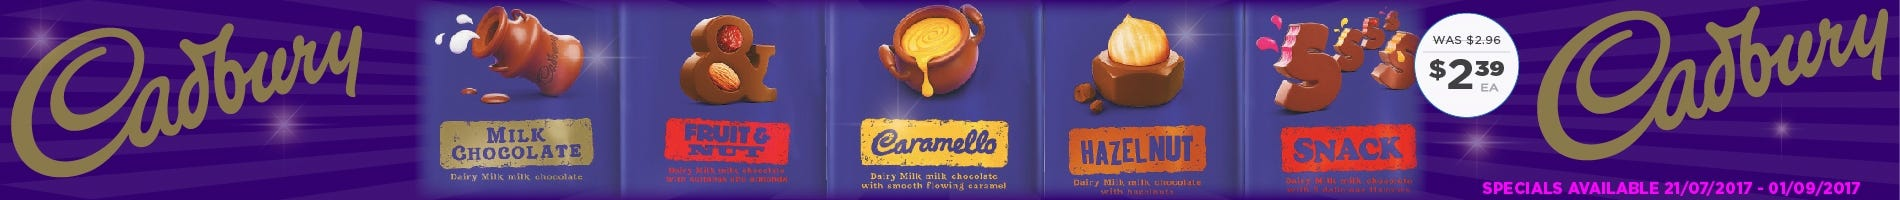 Click to Shop Medium Cadbury